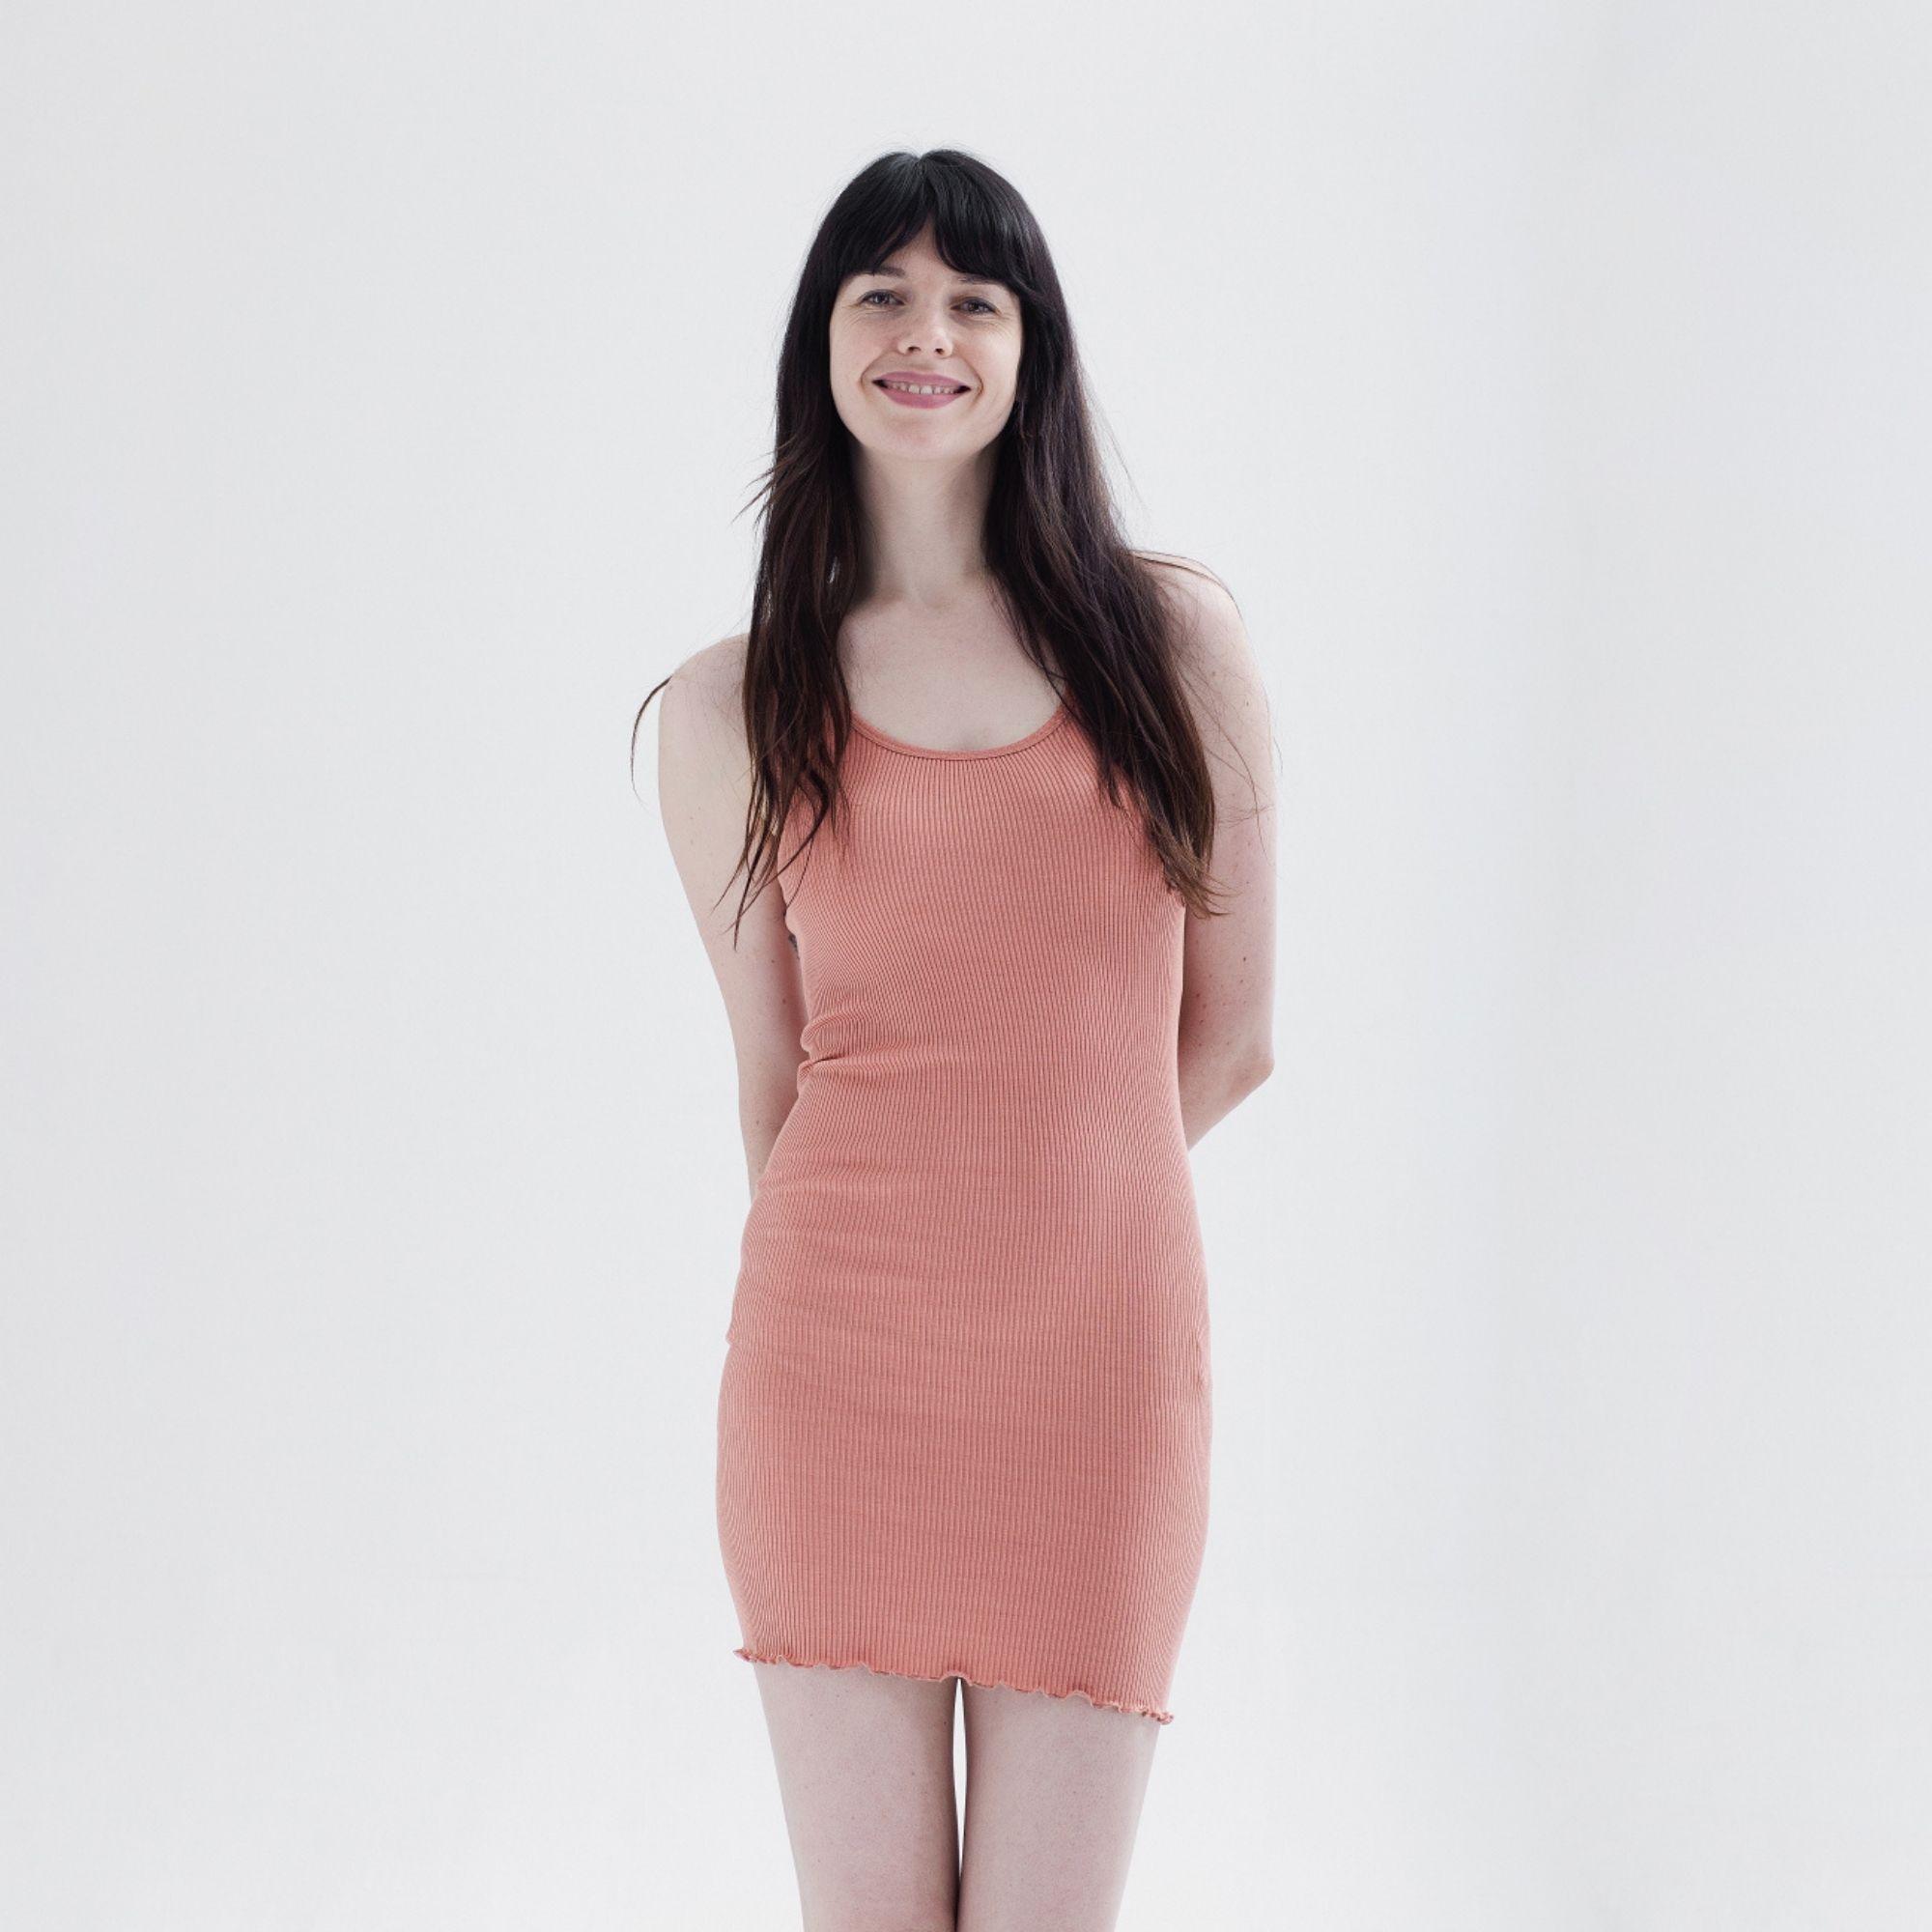 MINIMALISMA - Robe ou débardeur femme - Soie 70% / coton 30% - Gry - Tan